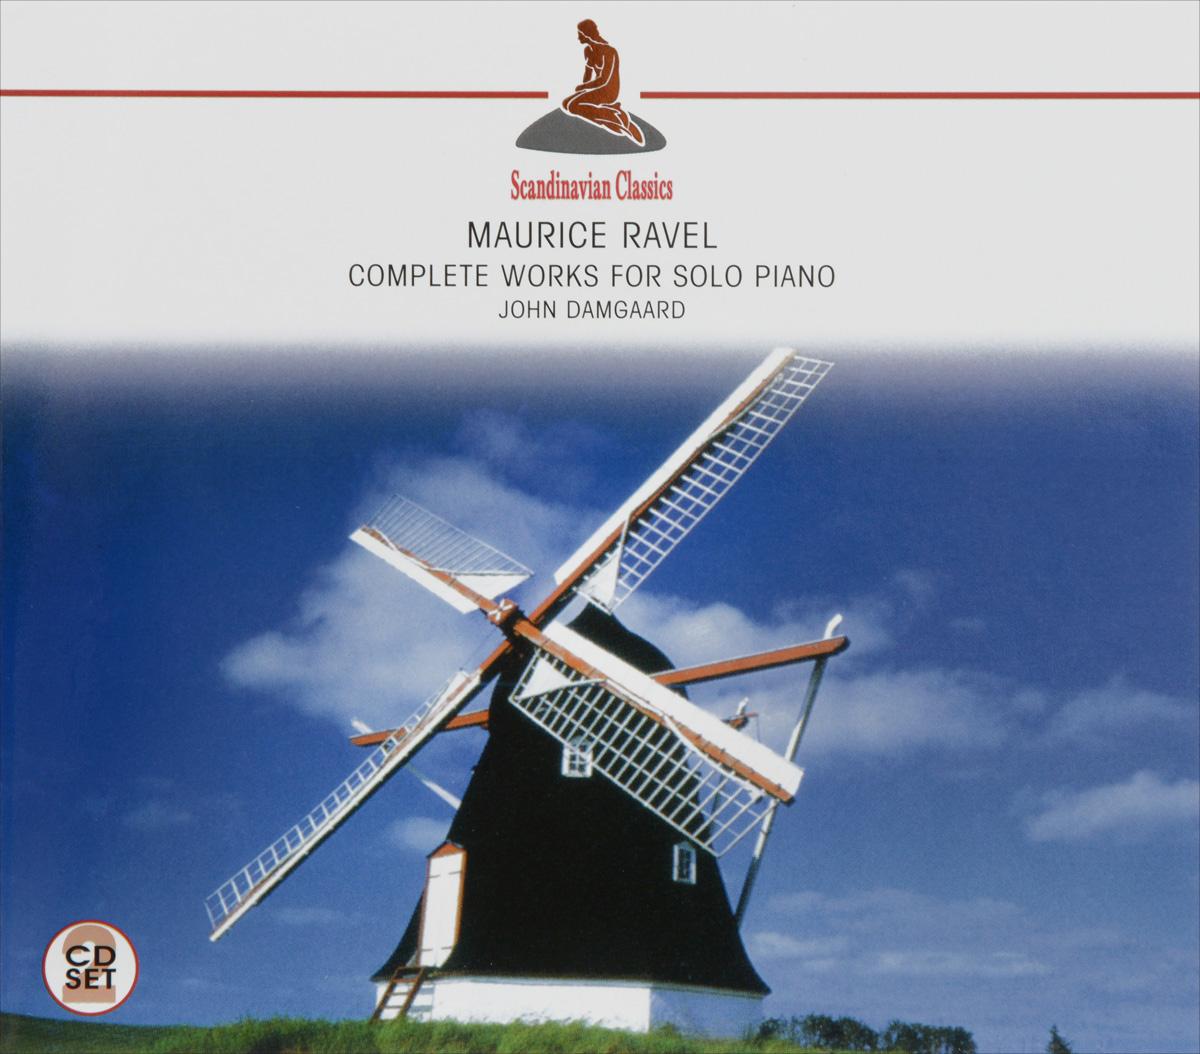 John Damgaard Scandinavian Classics. John Damgaard. Maurice Ravel. Complete Works For Solo Piano (2 CD)